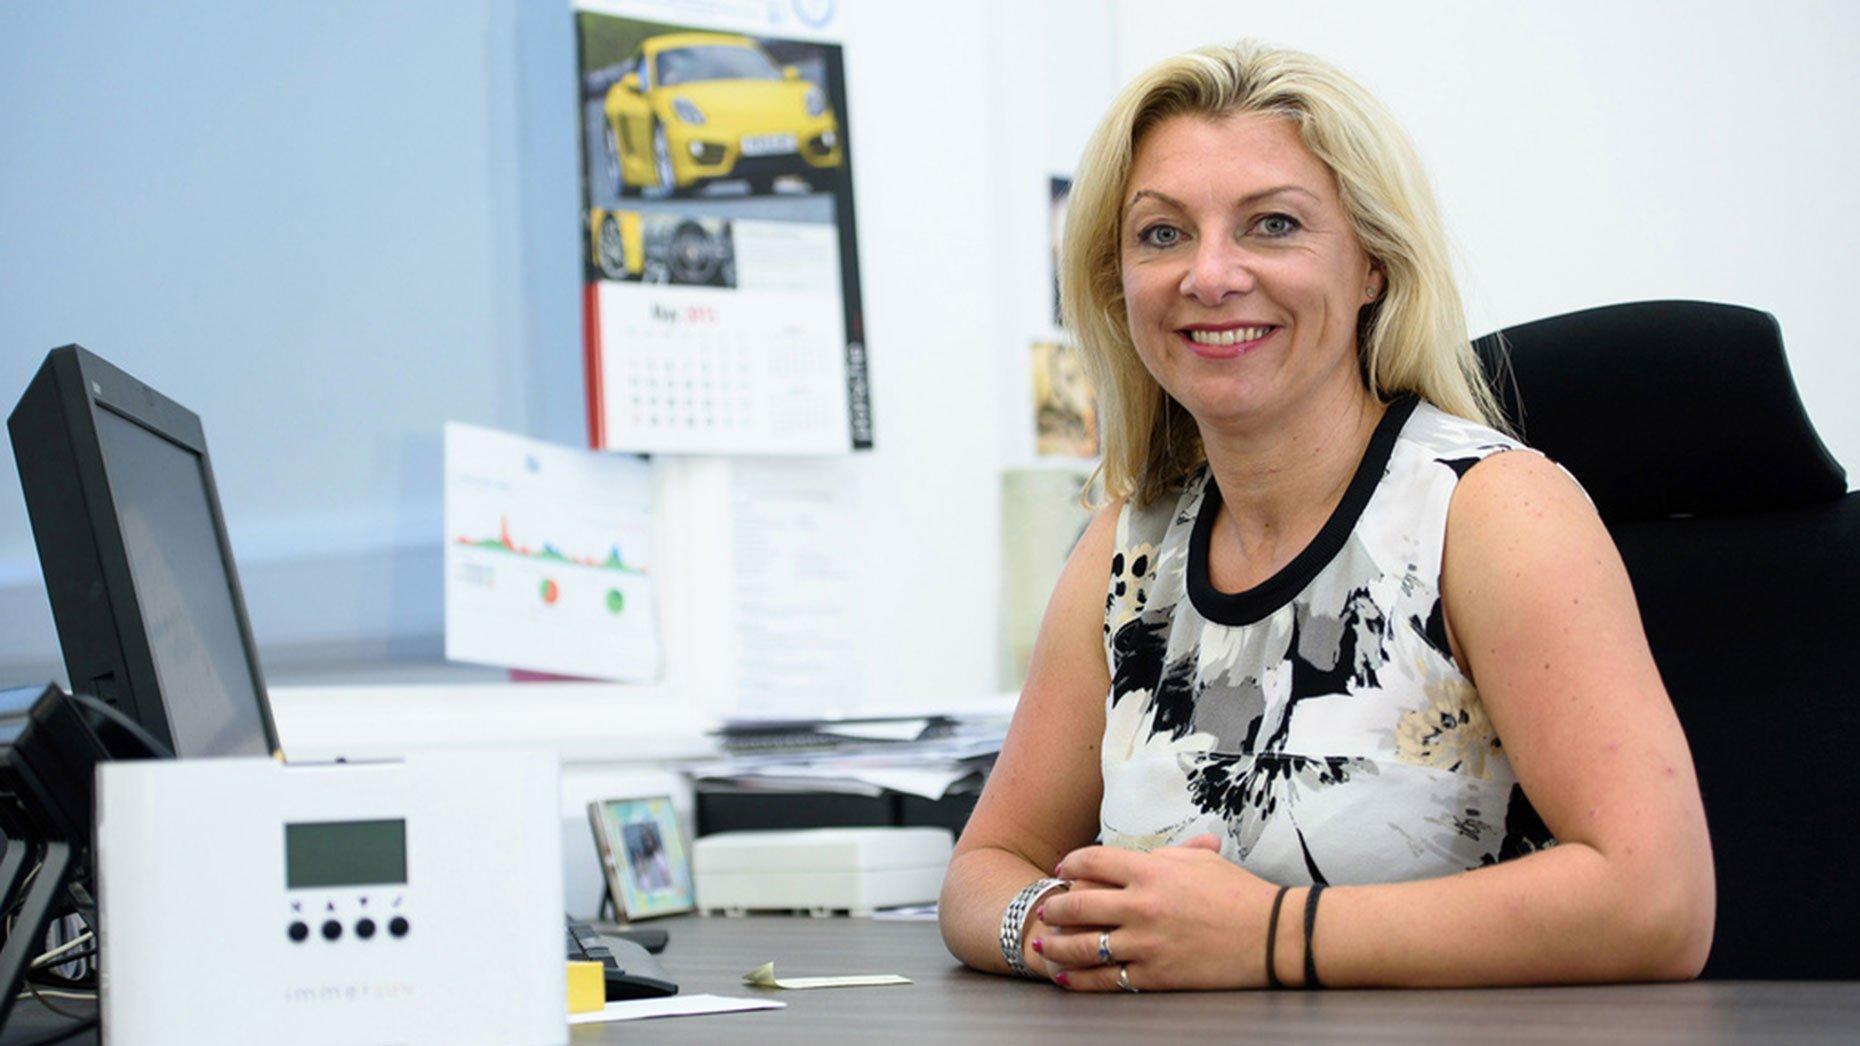 Jodi Huggett. Photo: Steve Smailes for Lincolnshire Business